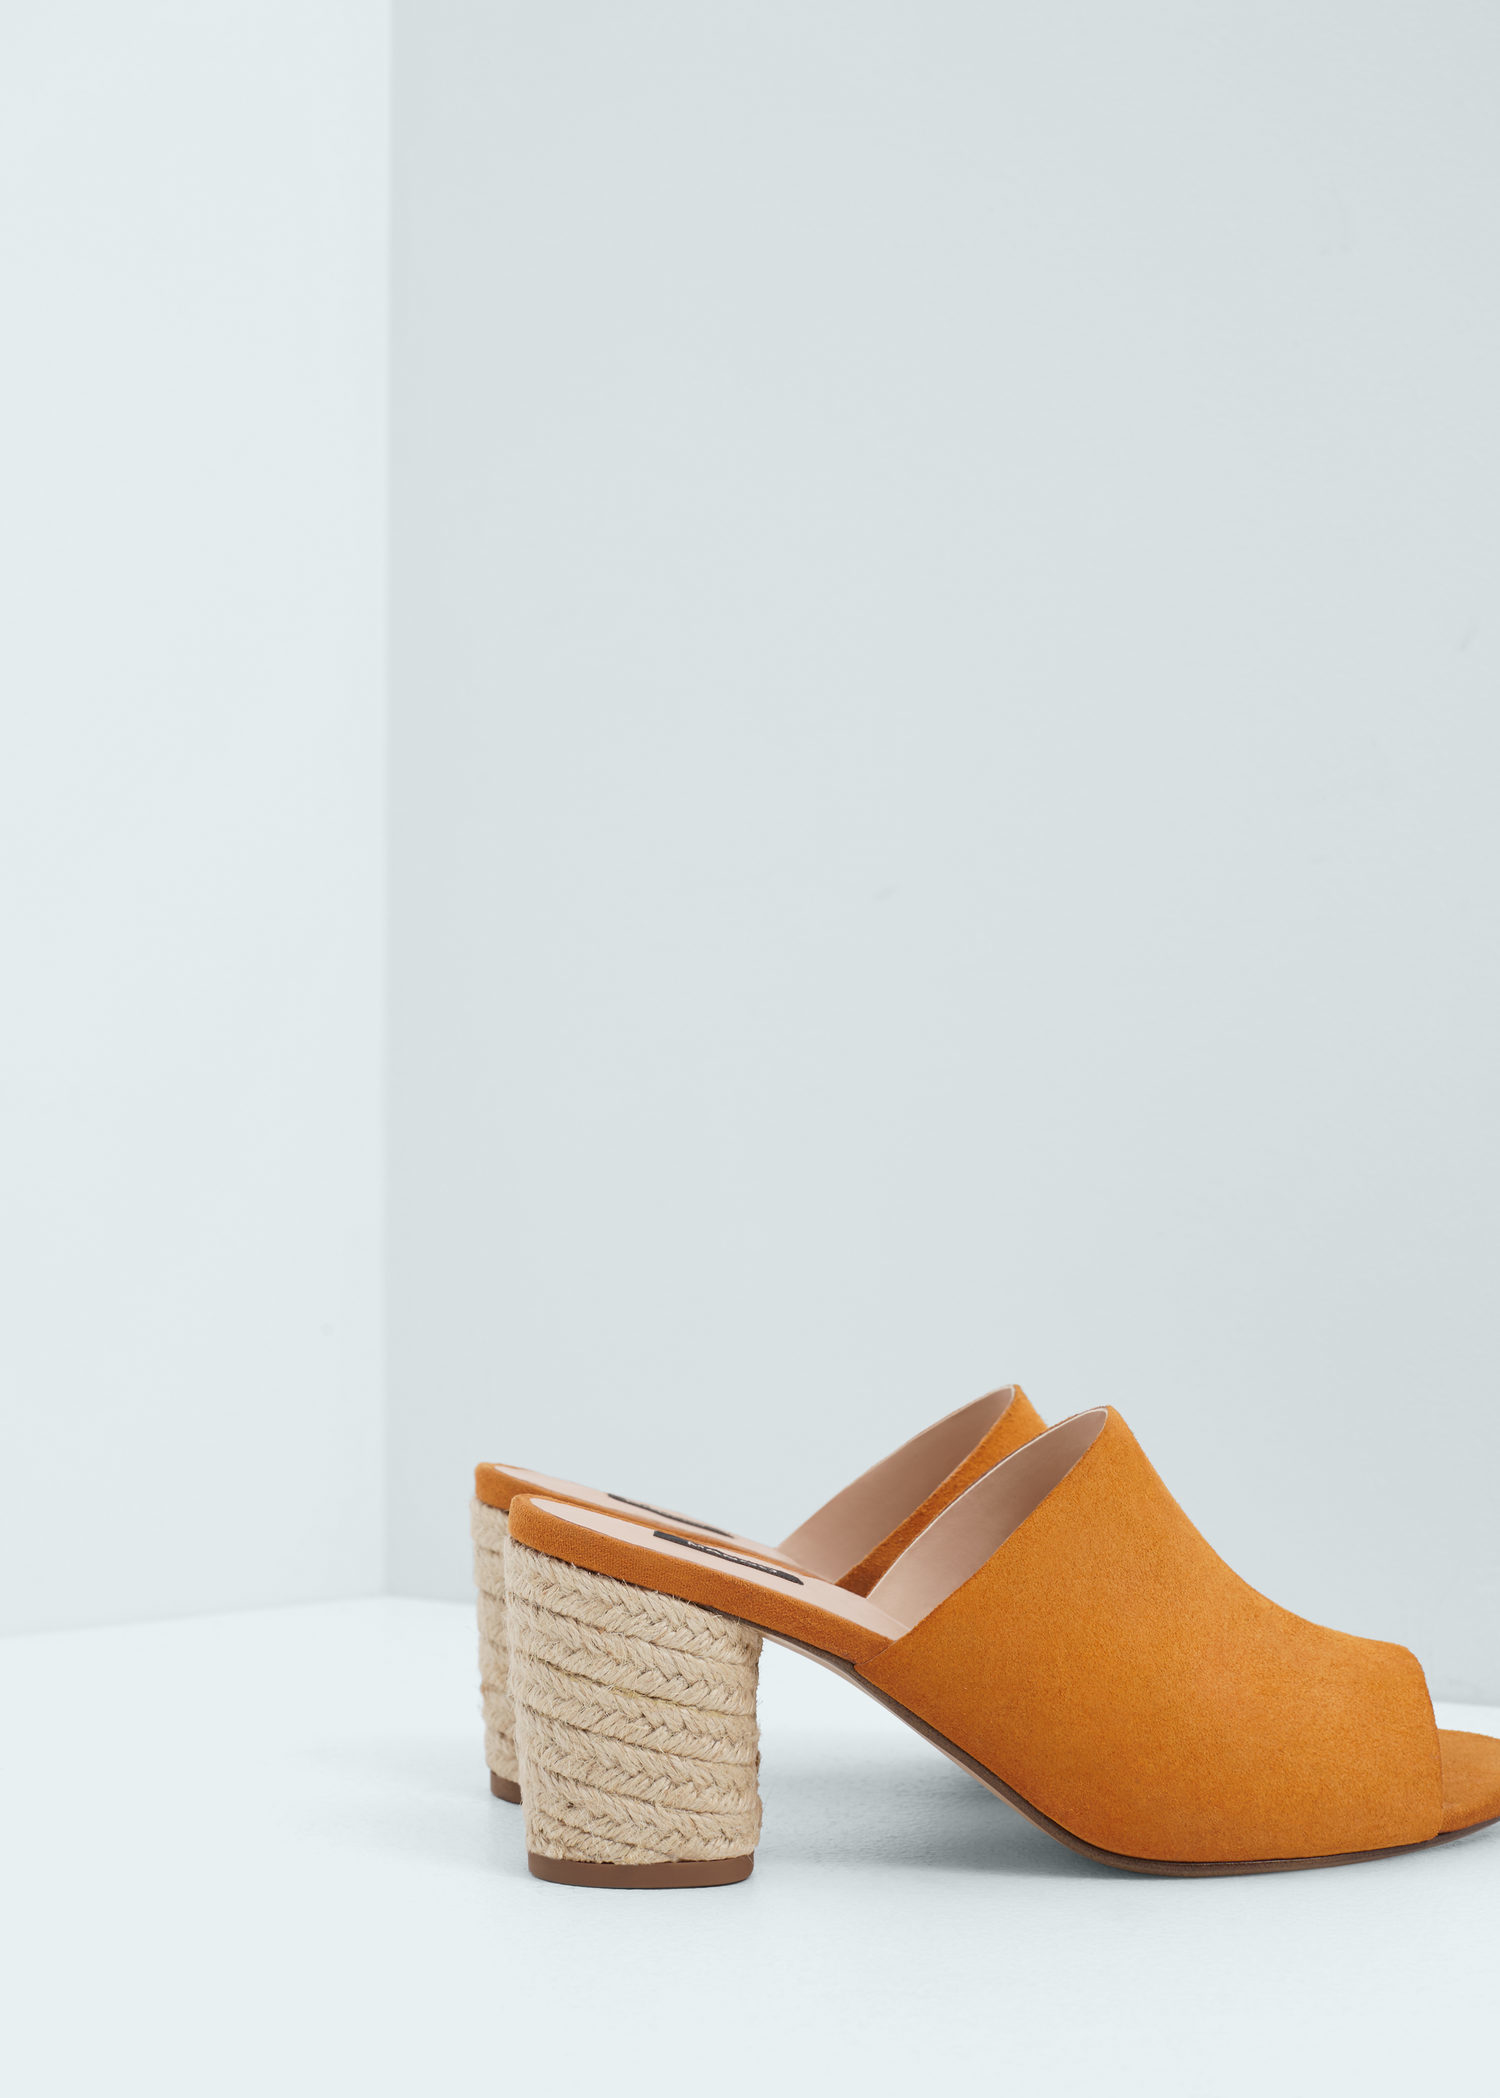 ab924e75fdf Lyst - Mango Esparto Leather Sandals in Yellow